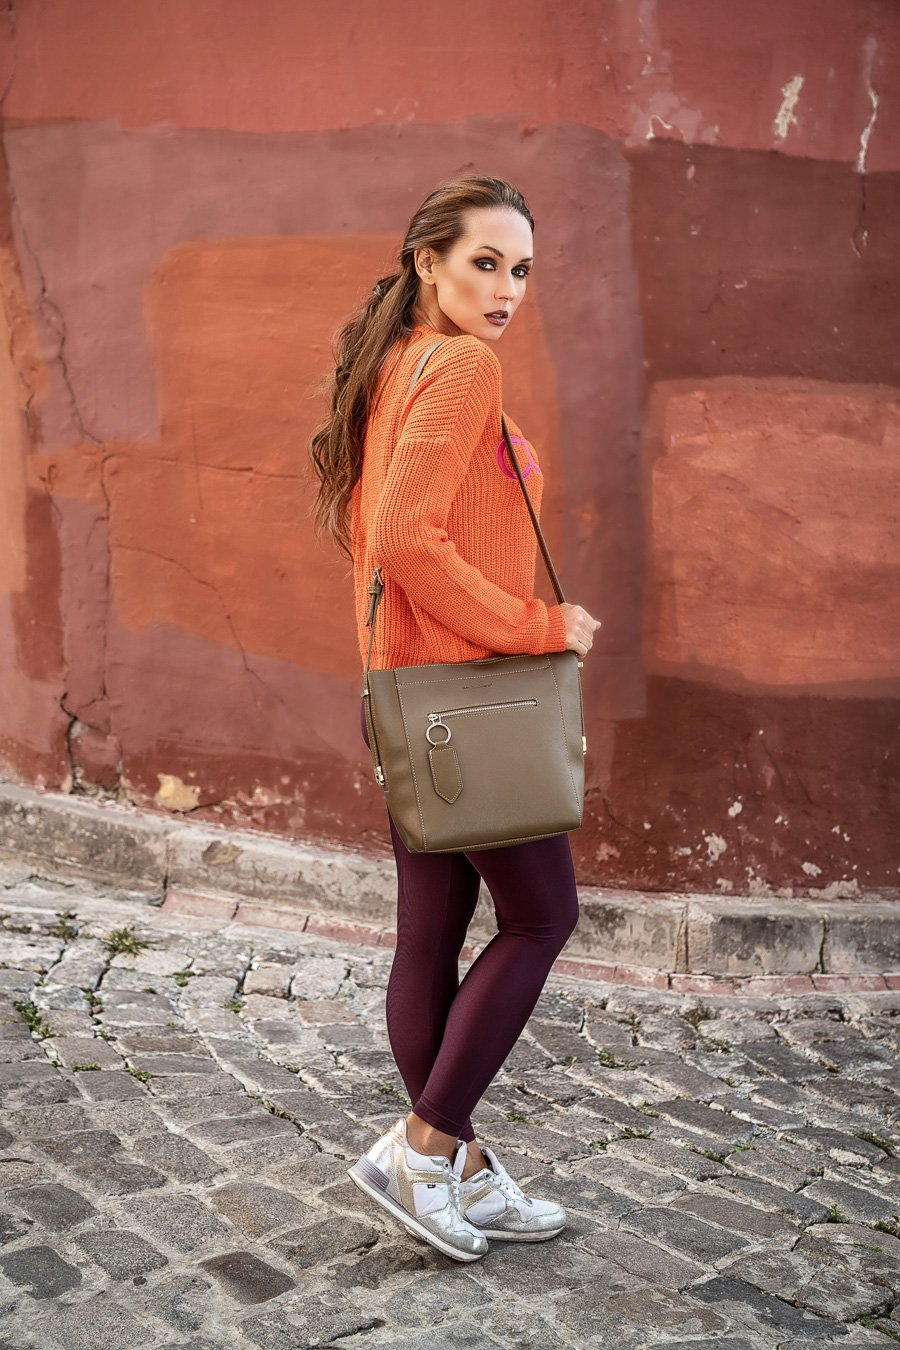 Moda Çekimi - Editorial - Beauty moda tekstil burakbulutfotografatolyesi 23